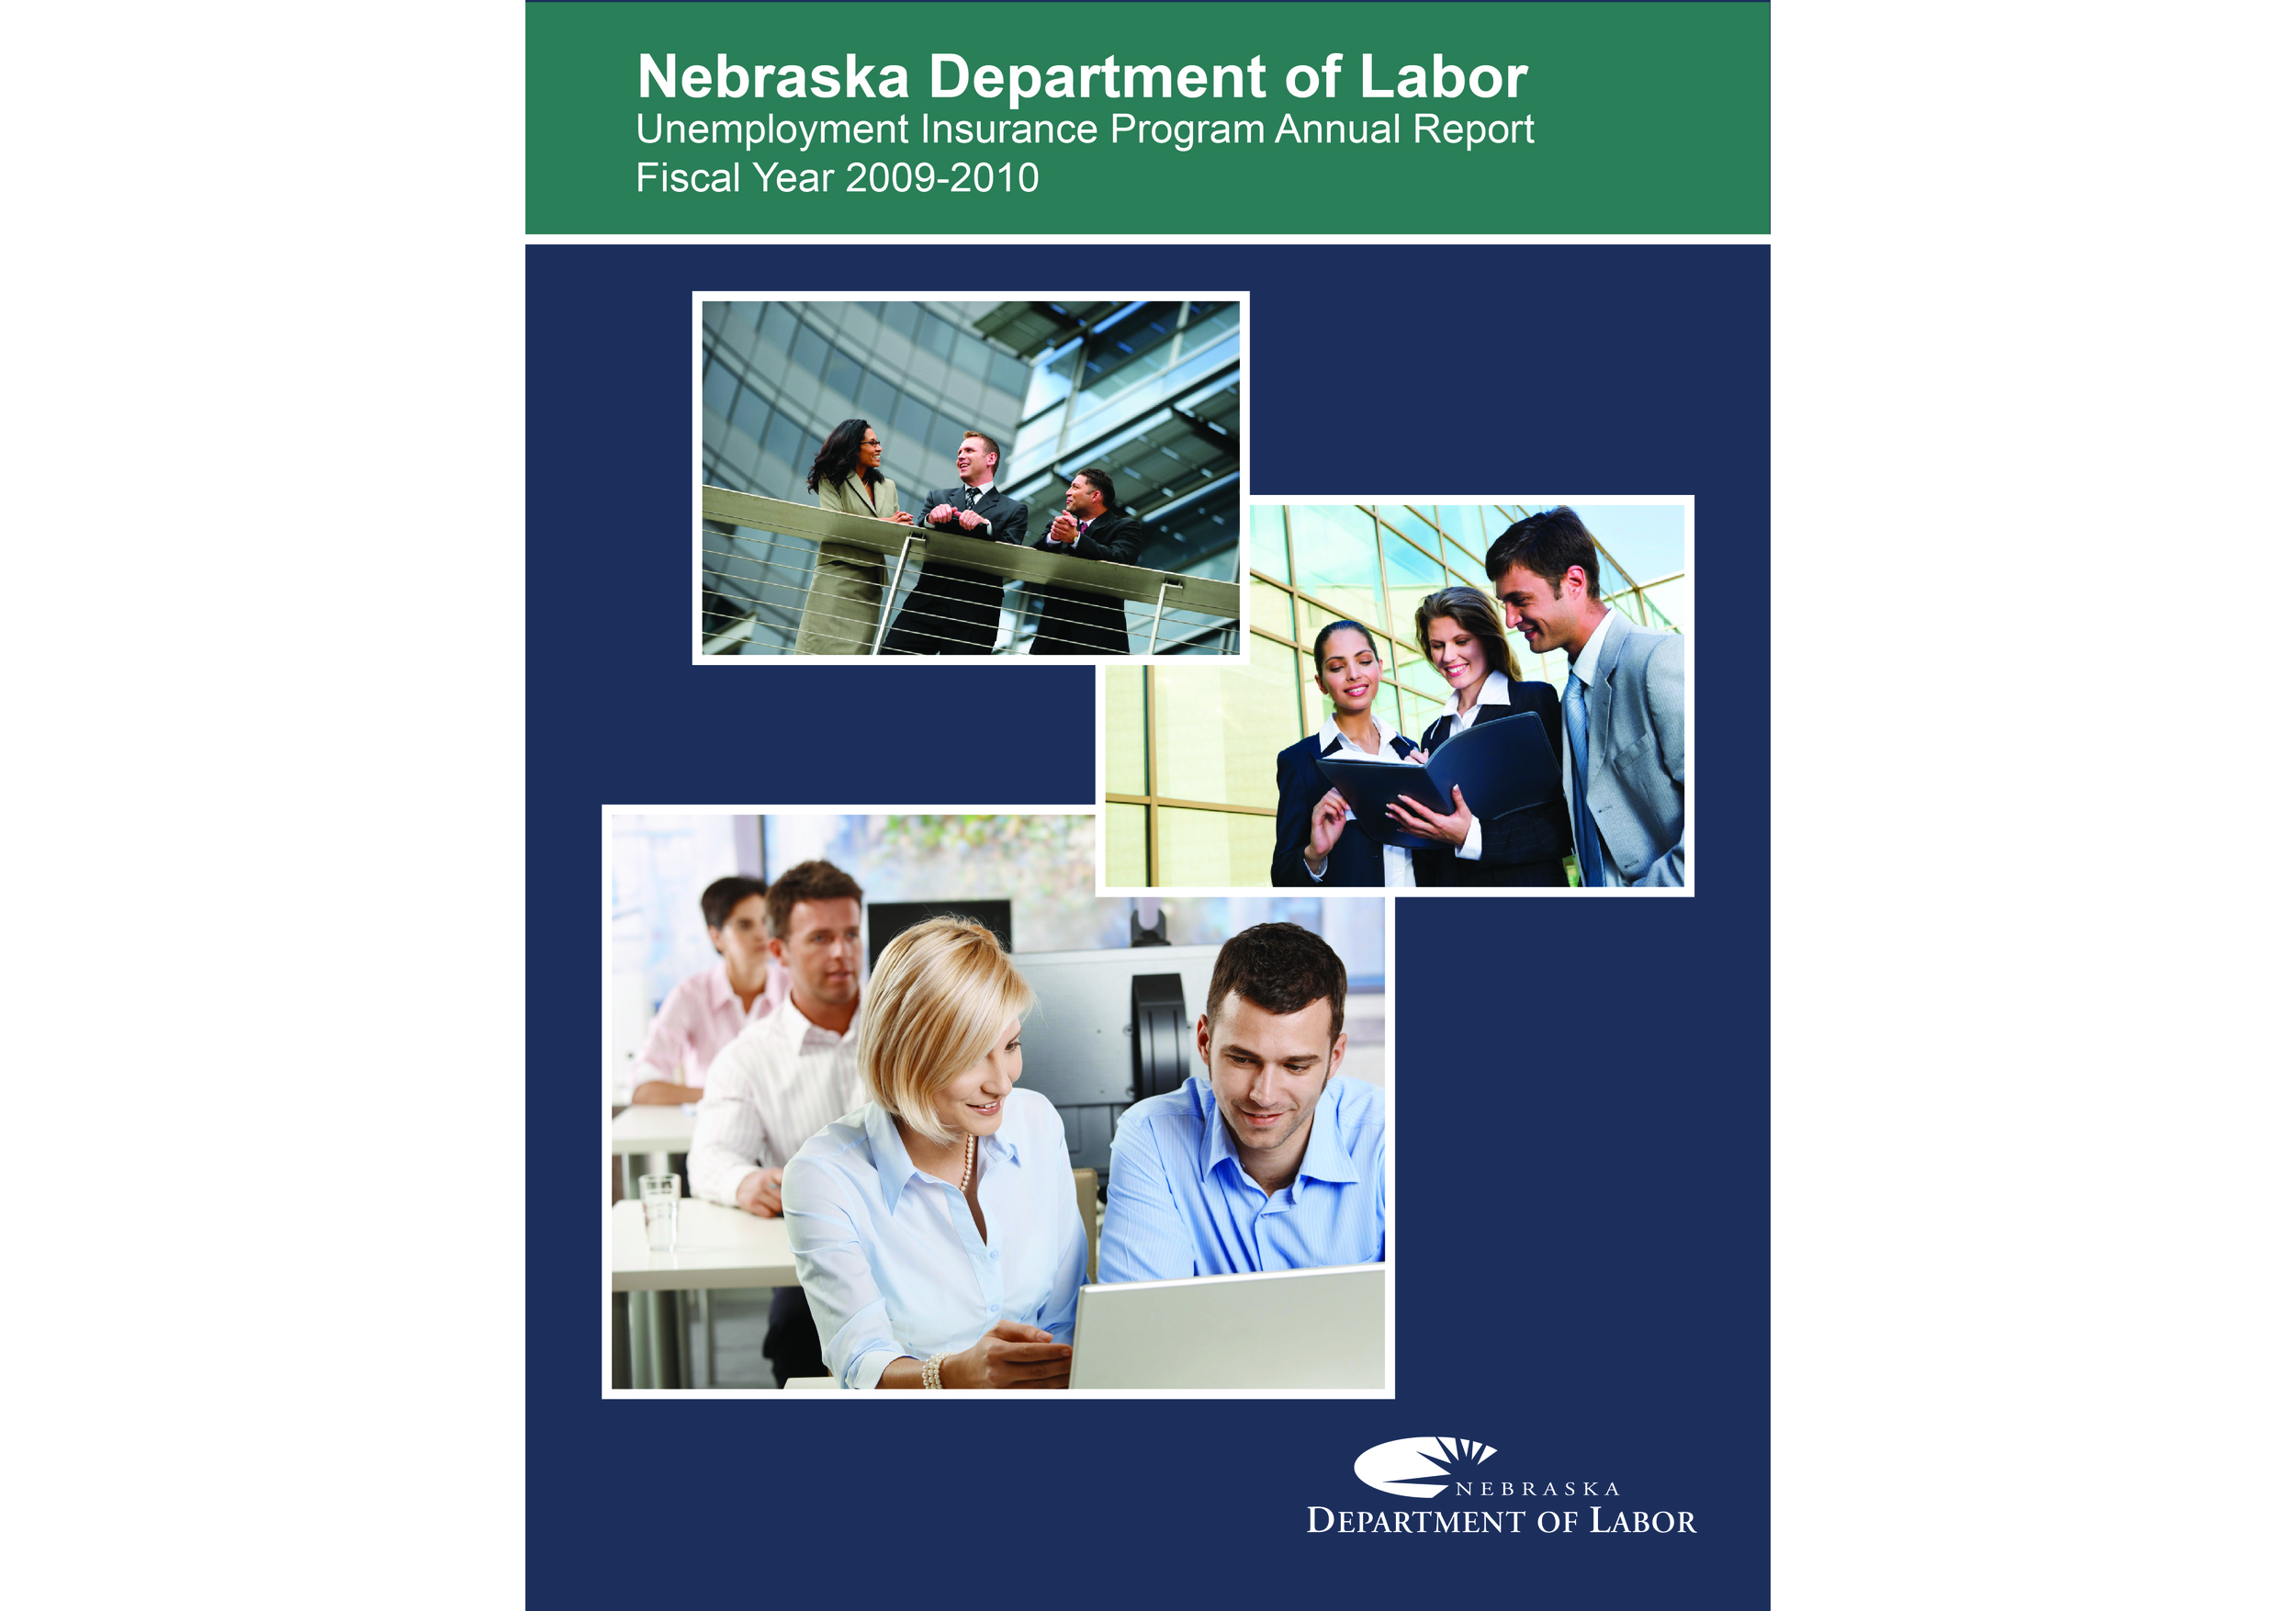 Unemployment Insurance Program Annual Report | 2010